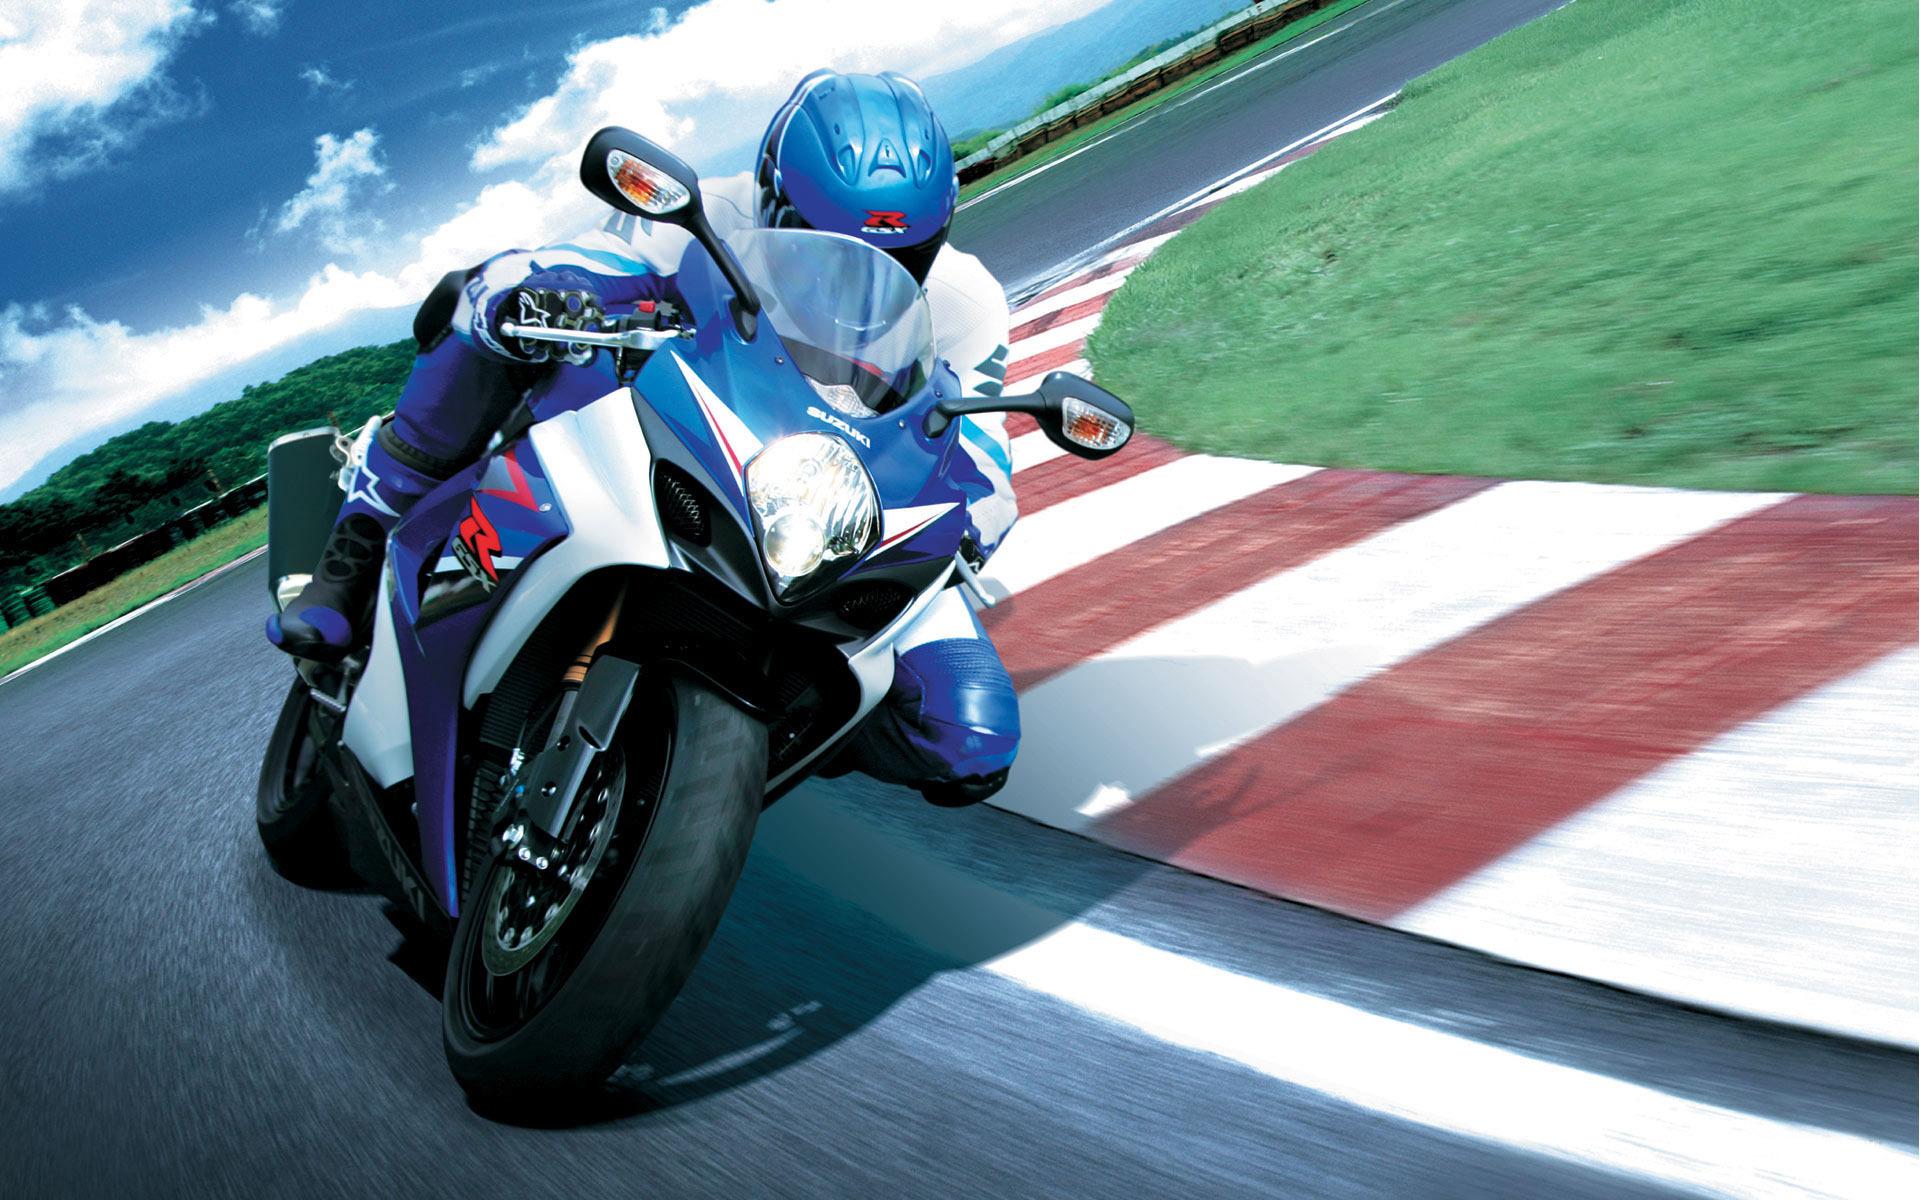 suzuki motorcycles wallpaper